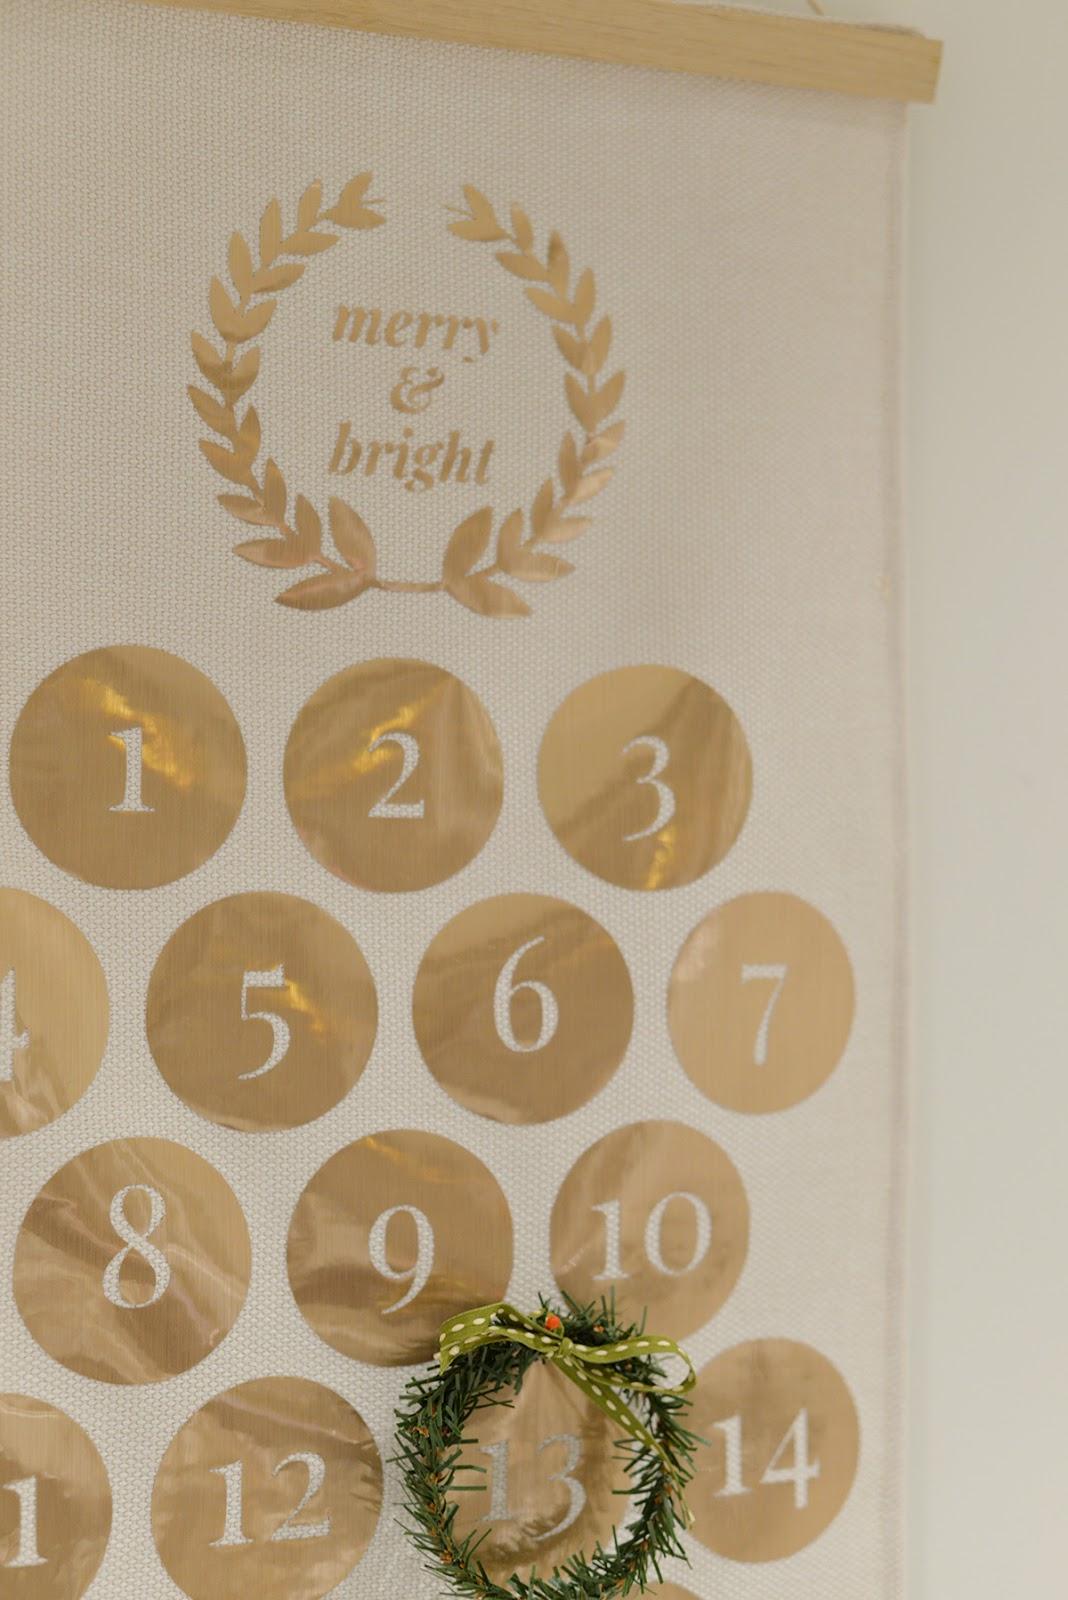 Cricut vinyl Christmas craft, modern traditional gold Christmas countdown calendar